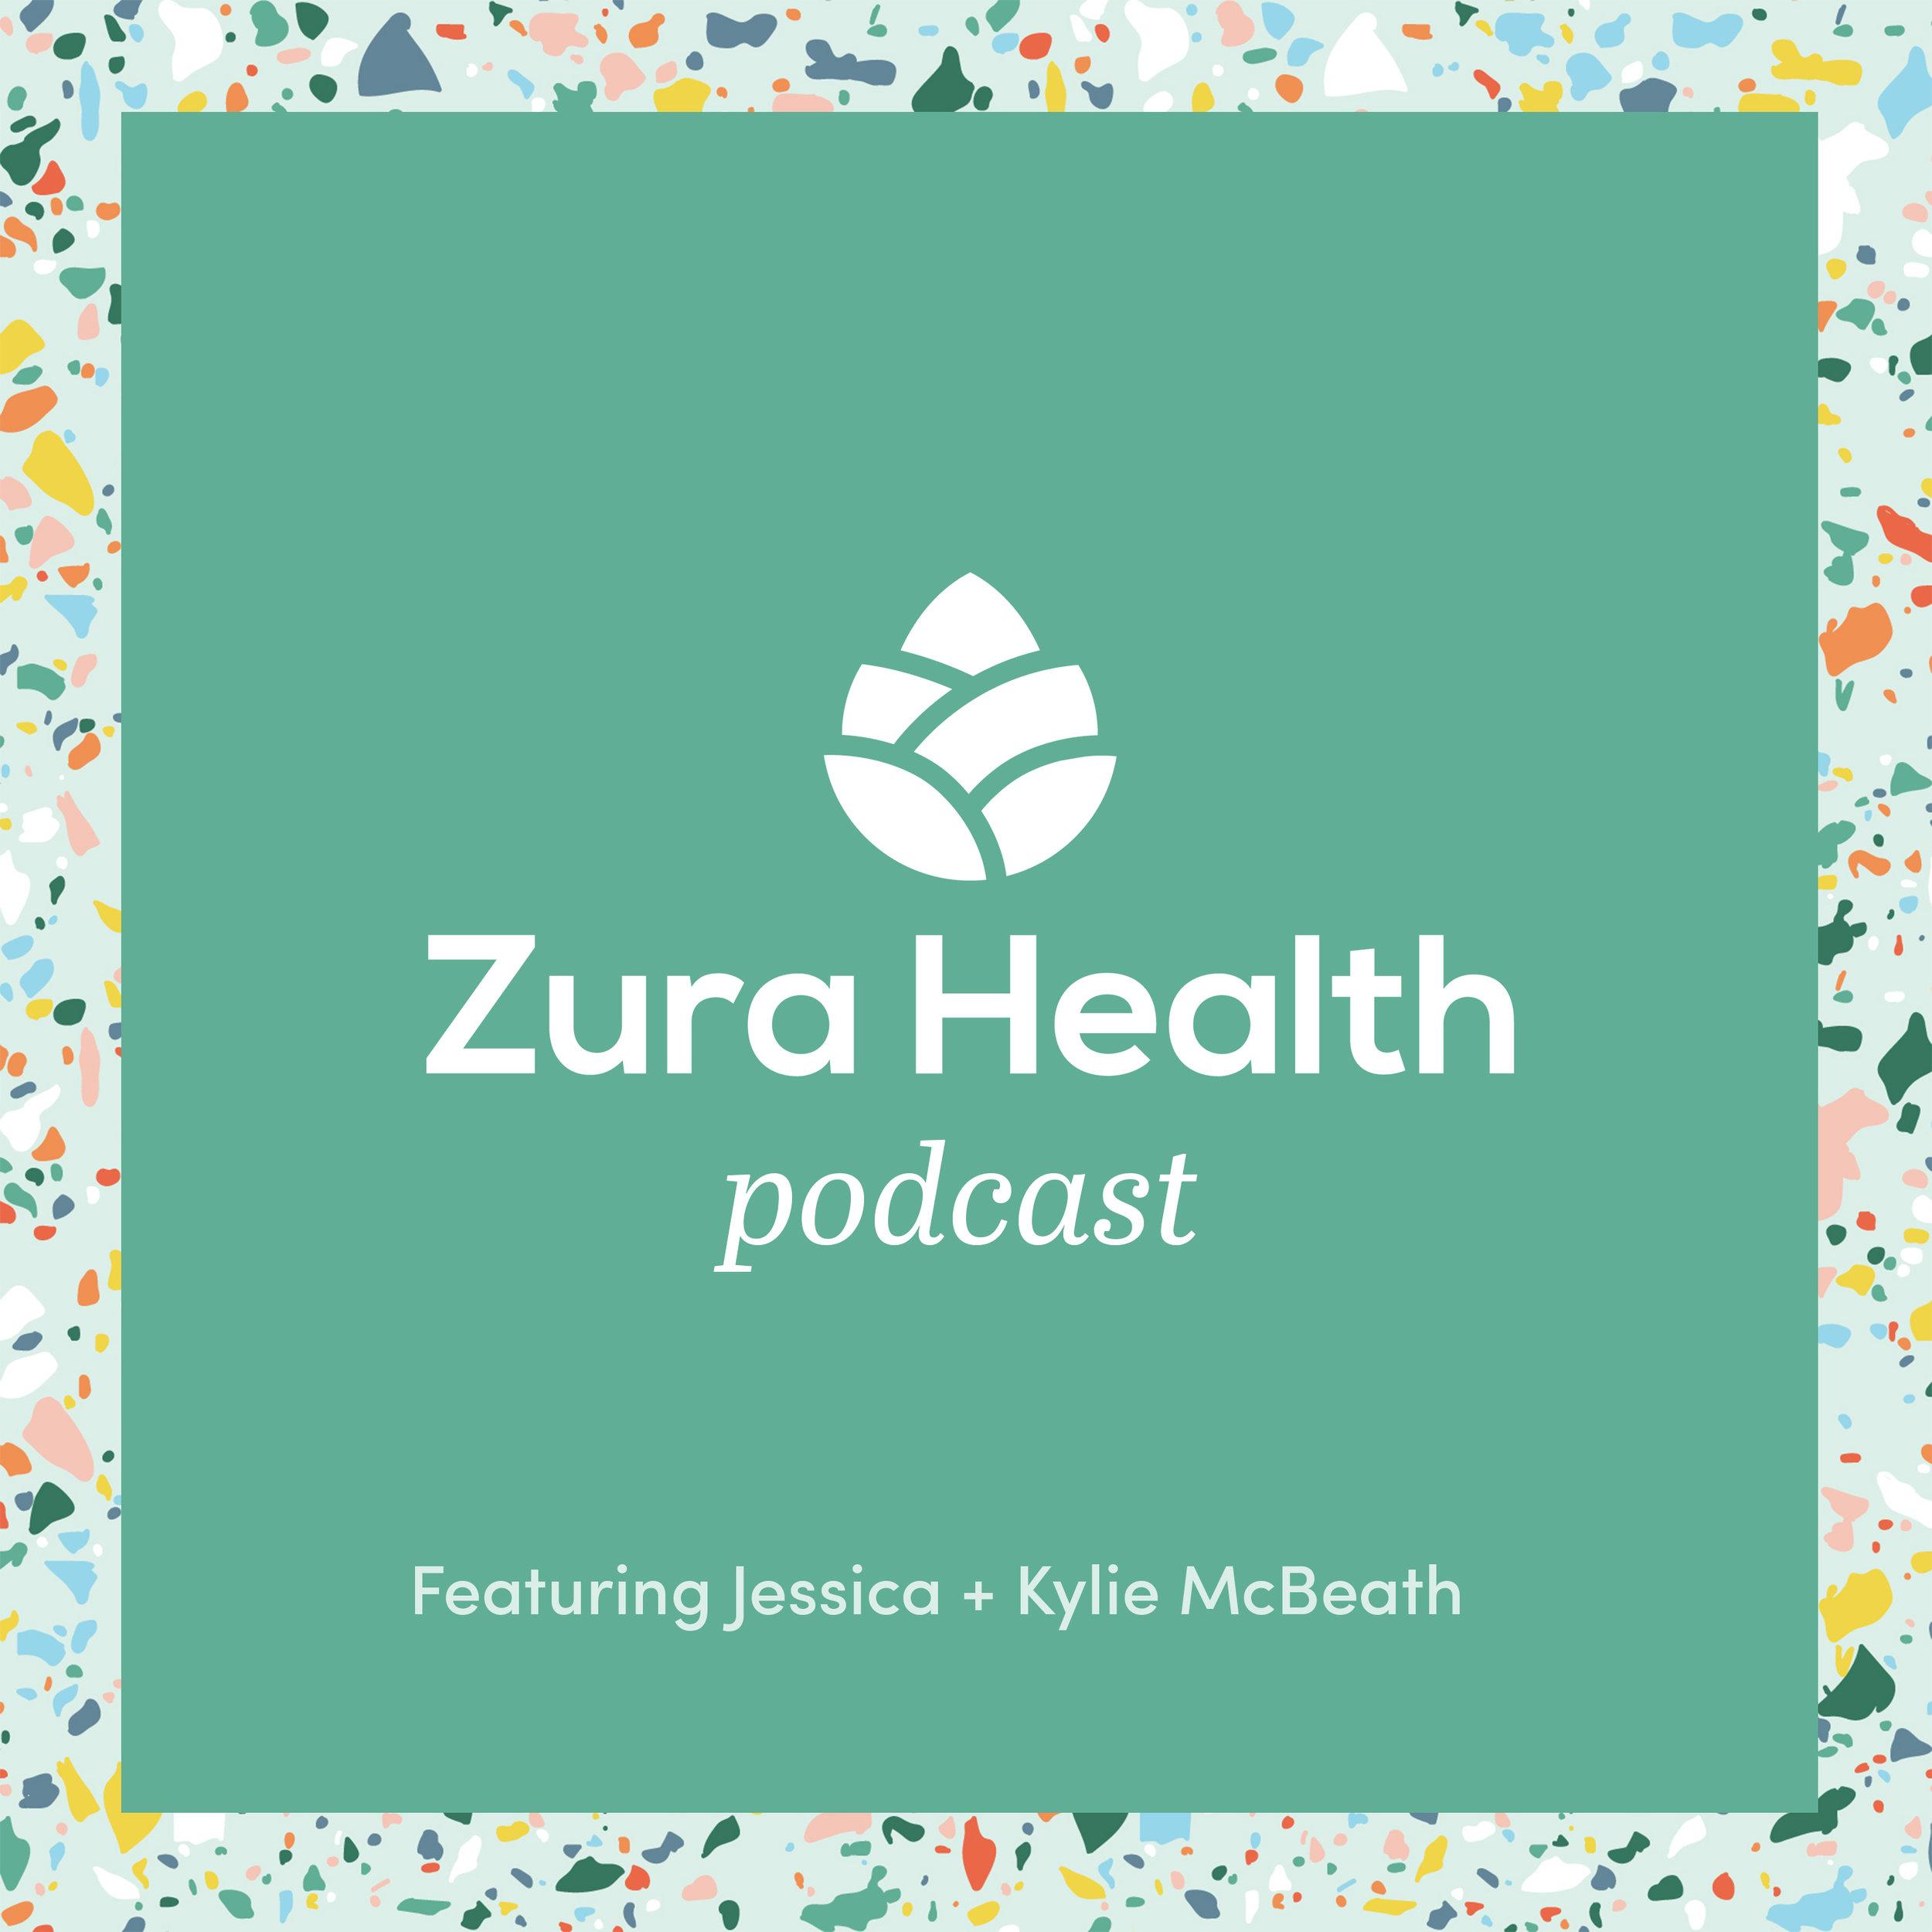 Zura Health Podcast with Jessica and Kylie McBeath